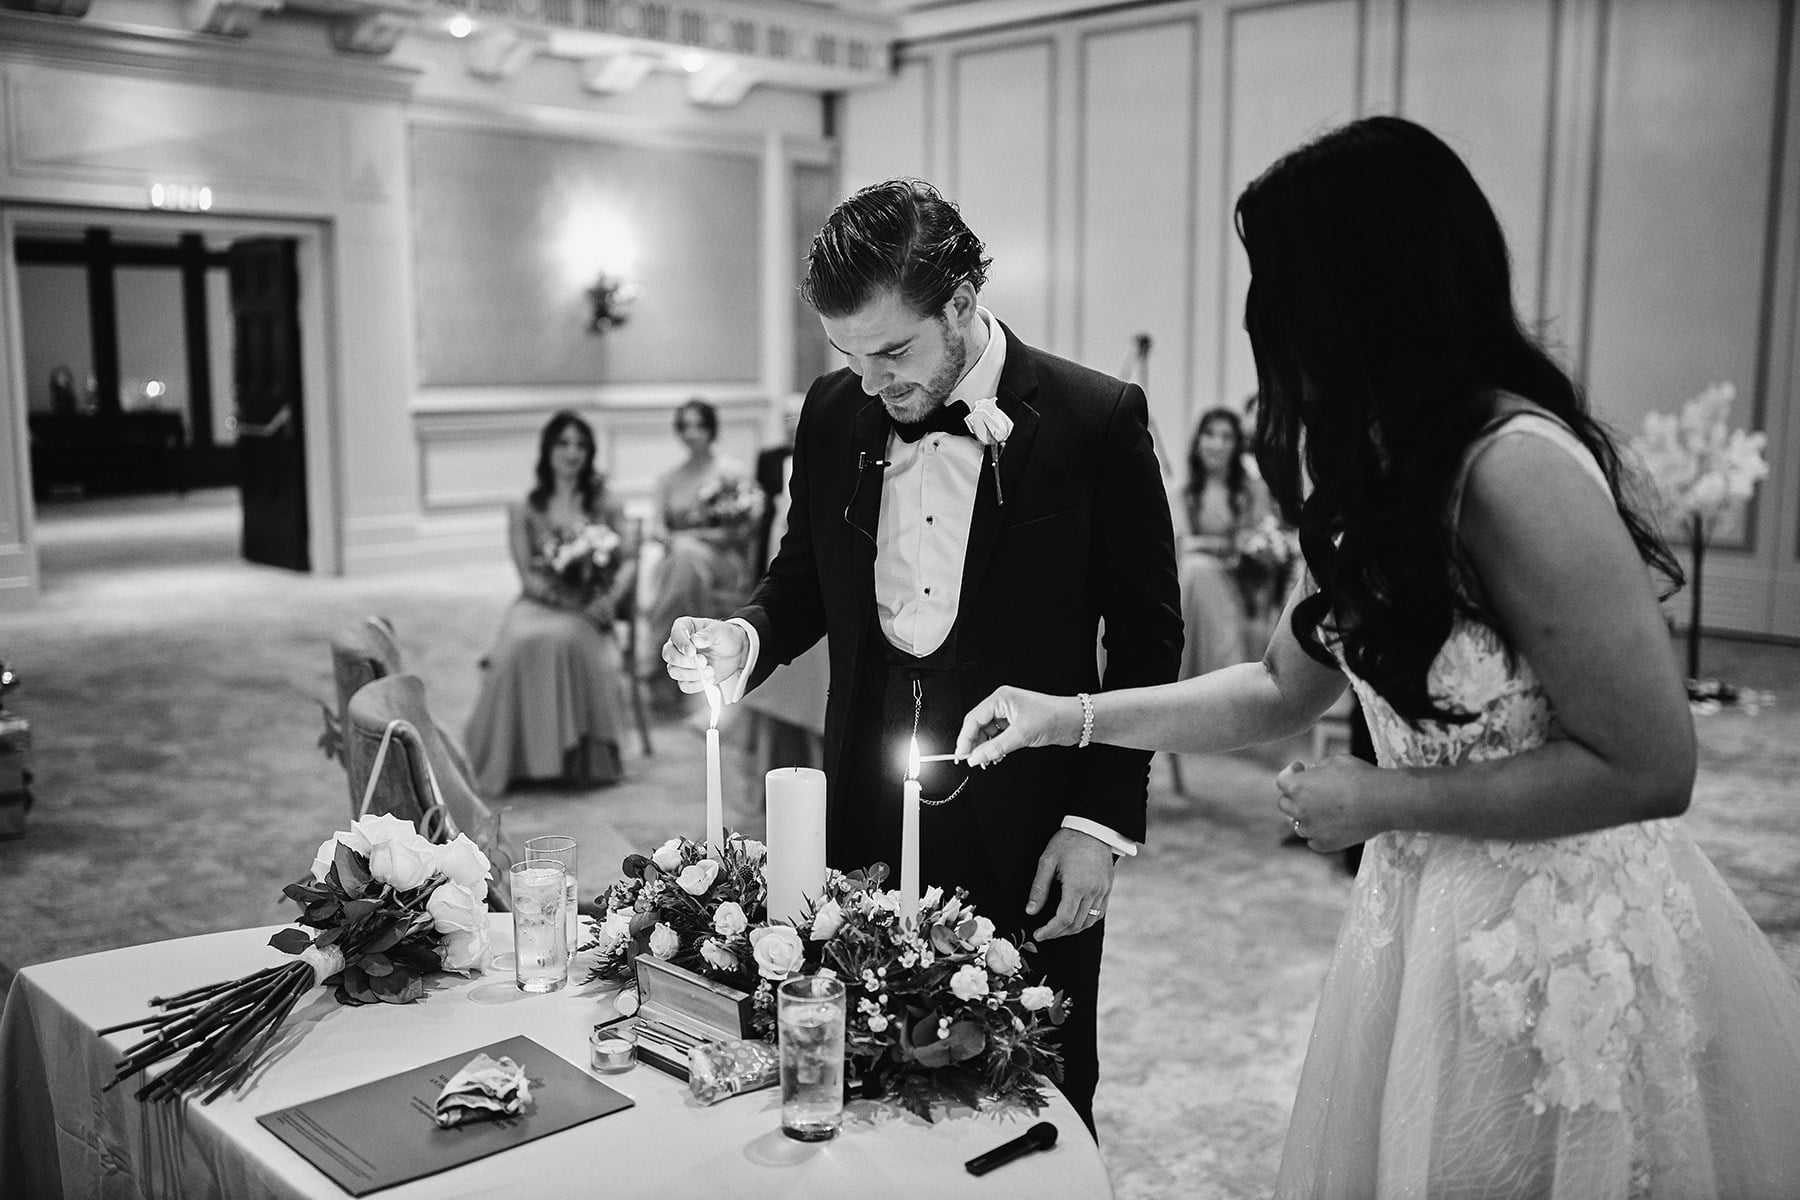 POWERSCOURT HOTEL RESORT INTIMATE WEDDING 59